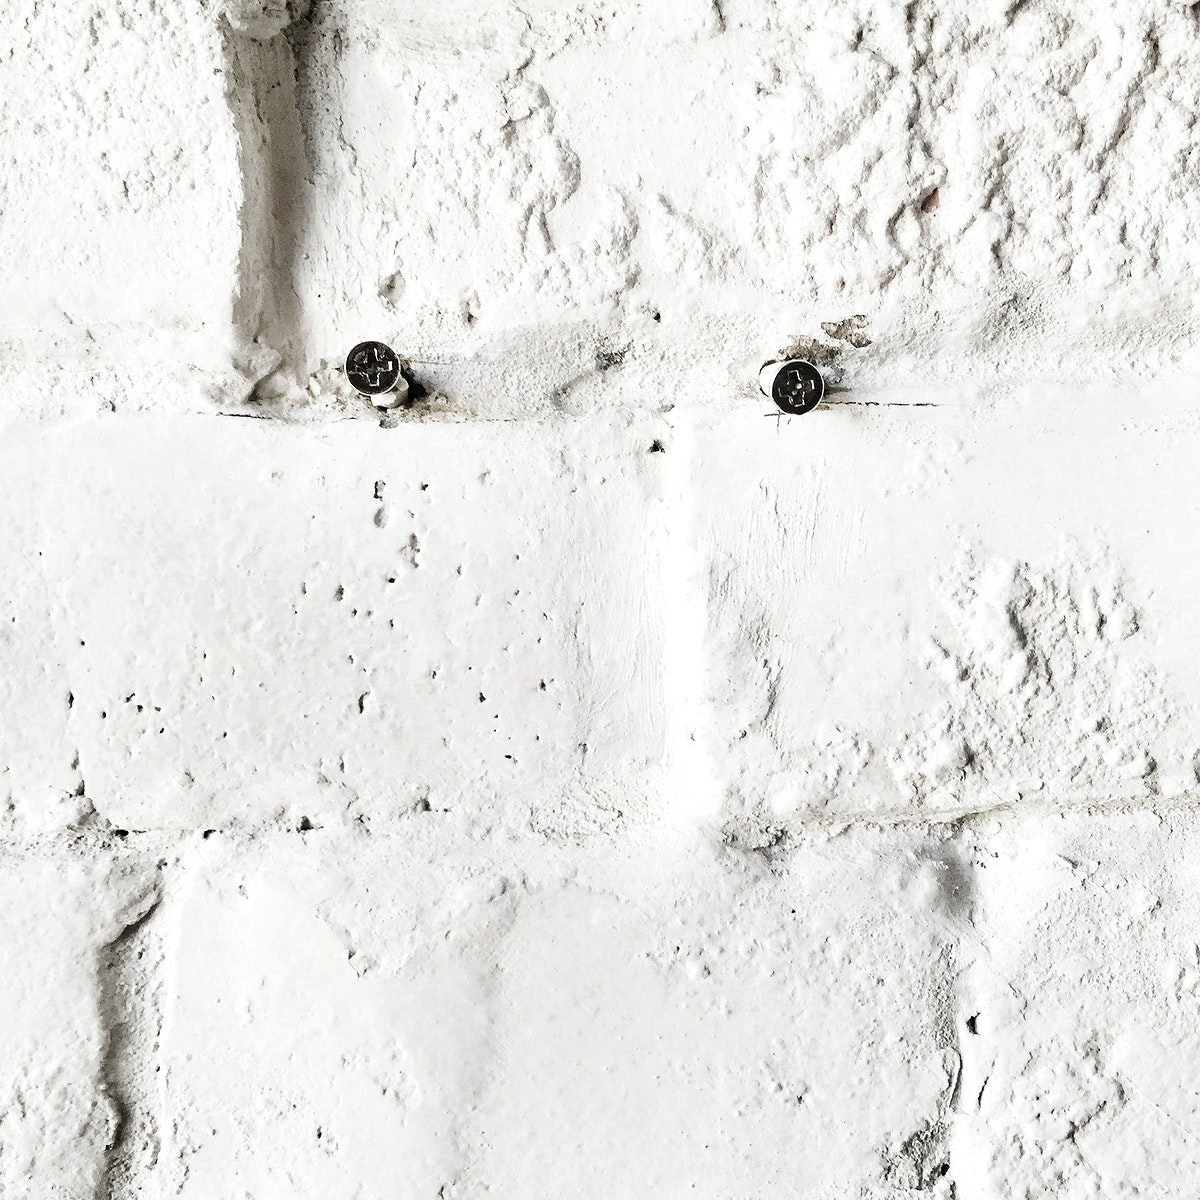 Closeup of screws on concrete white brick wall